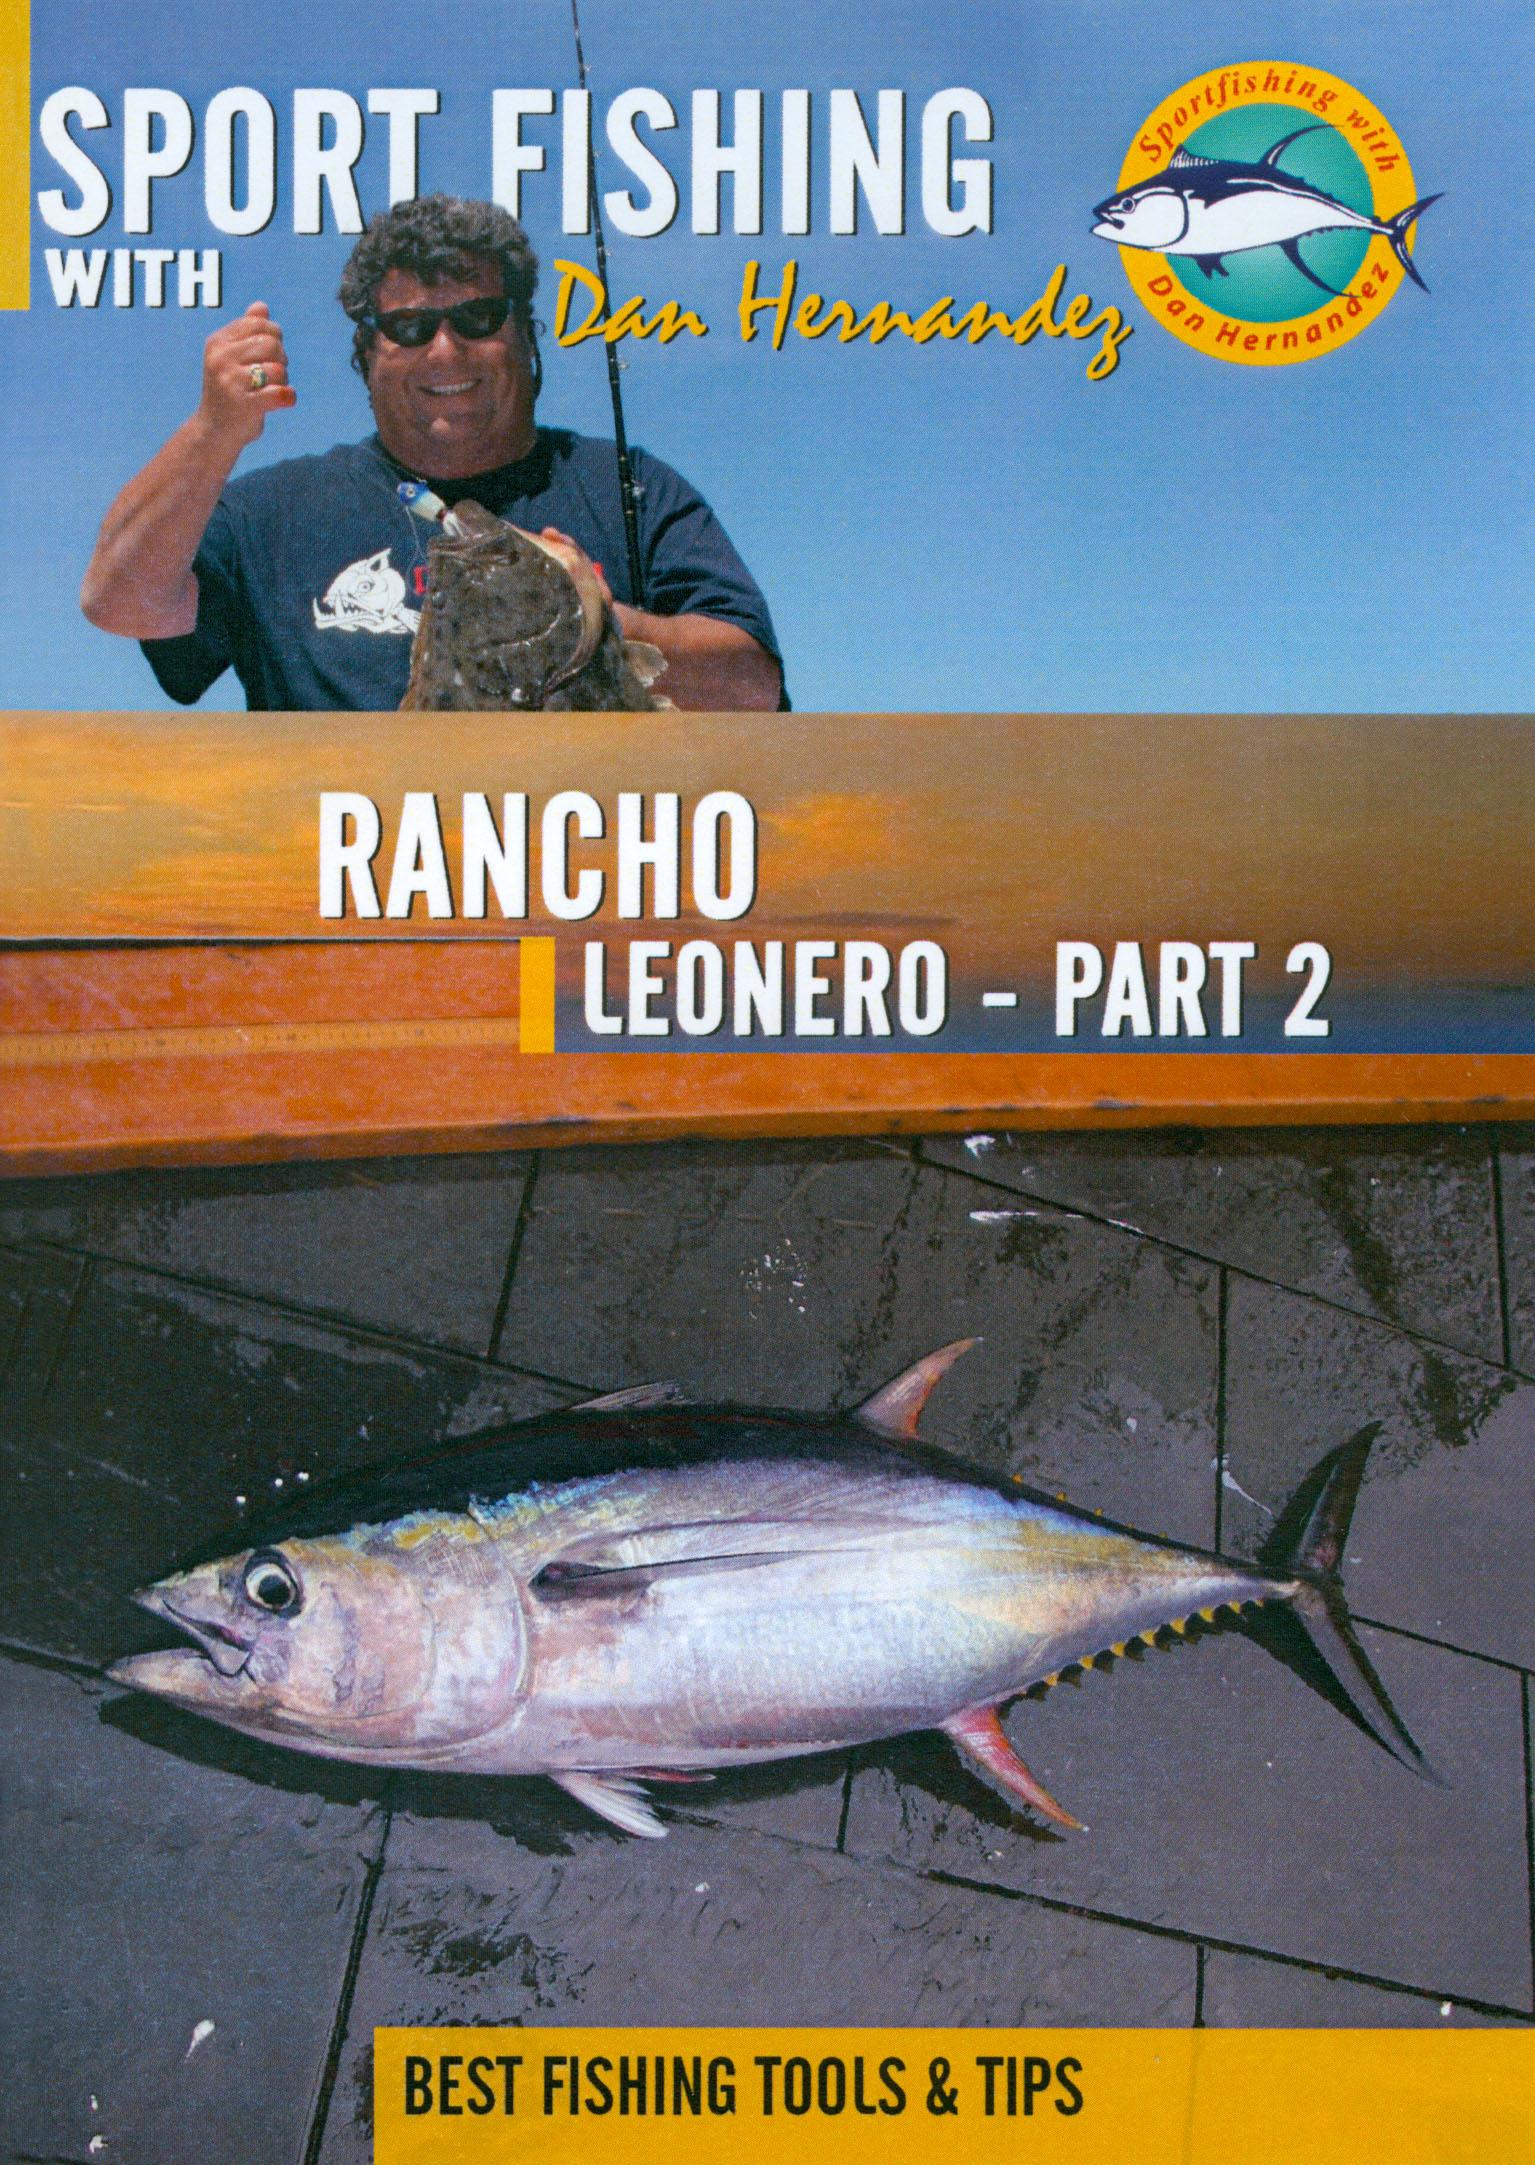 Sport Fishing With Dan Hernandez: Rancho Leonero, Part 2